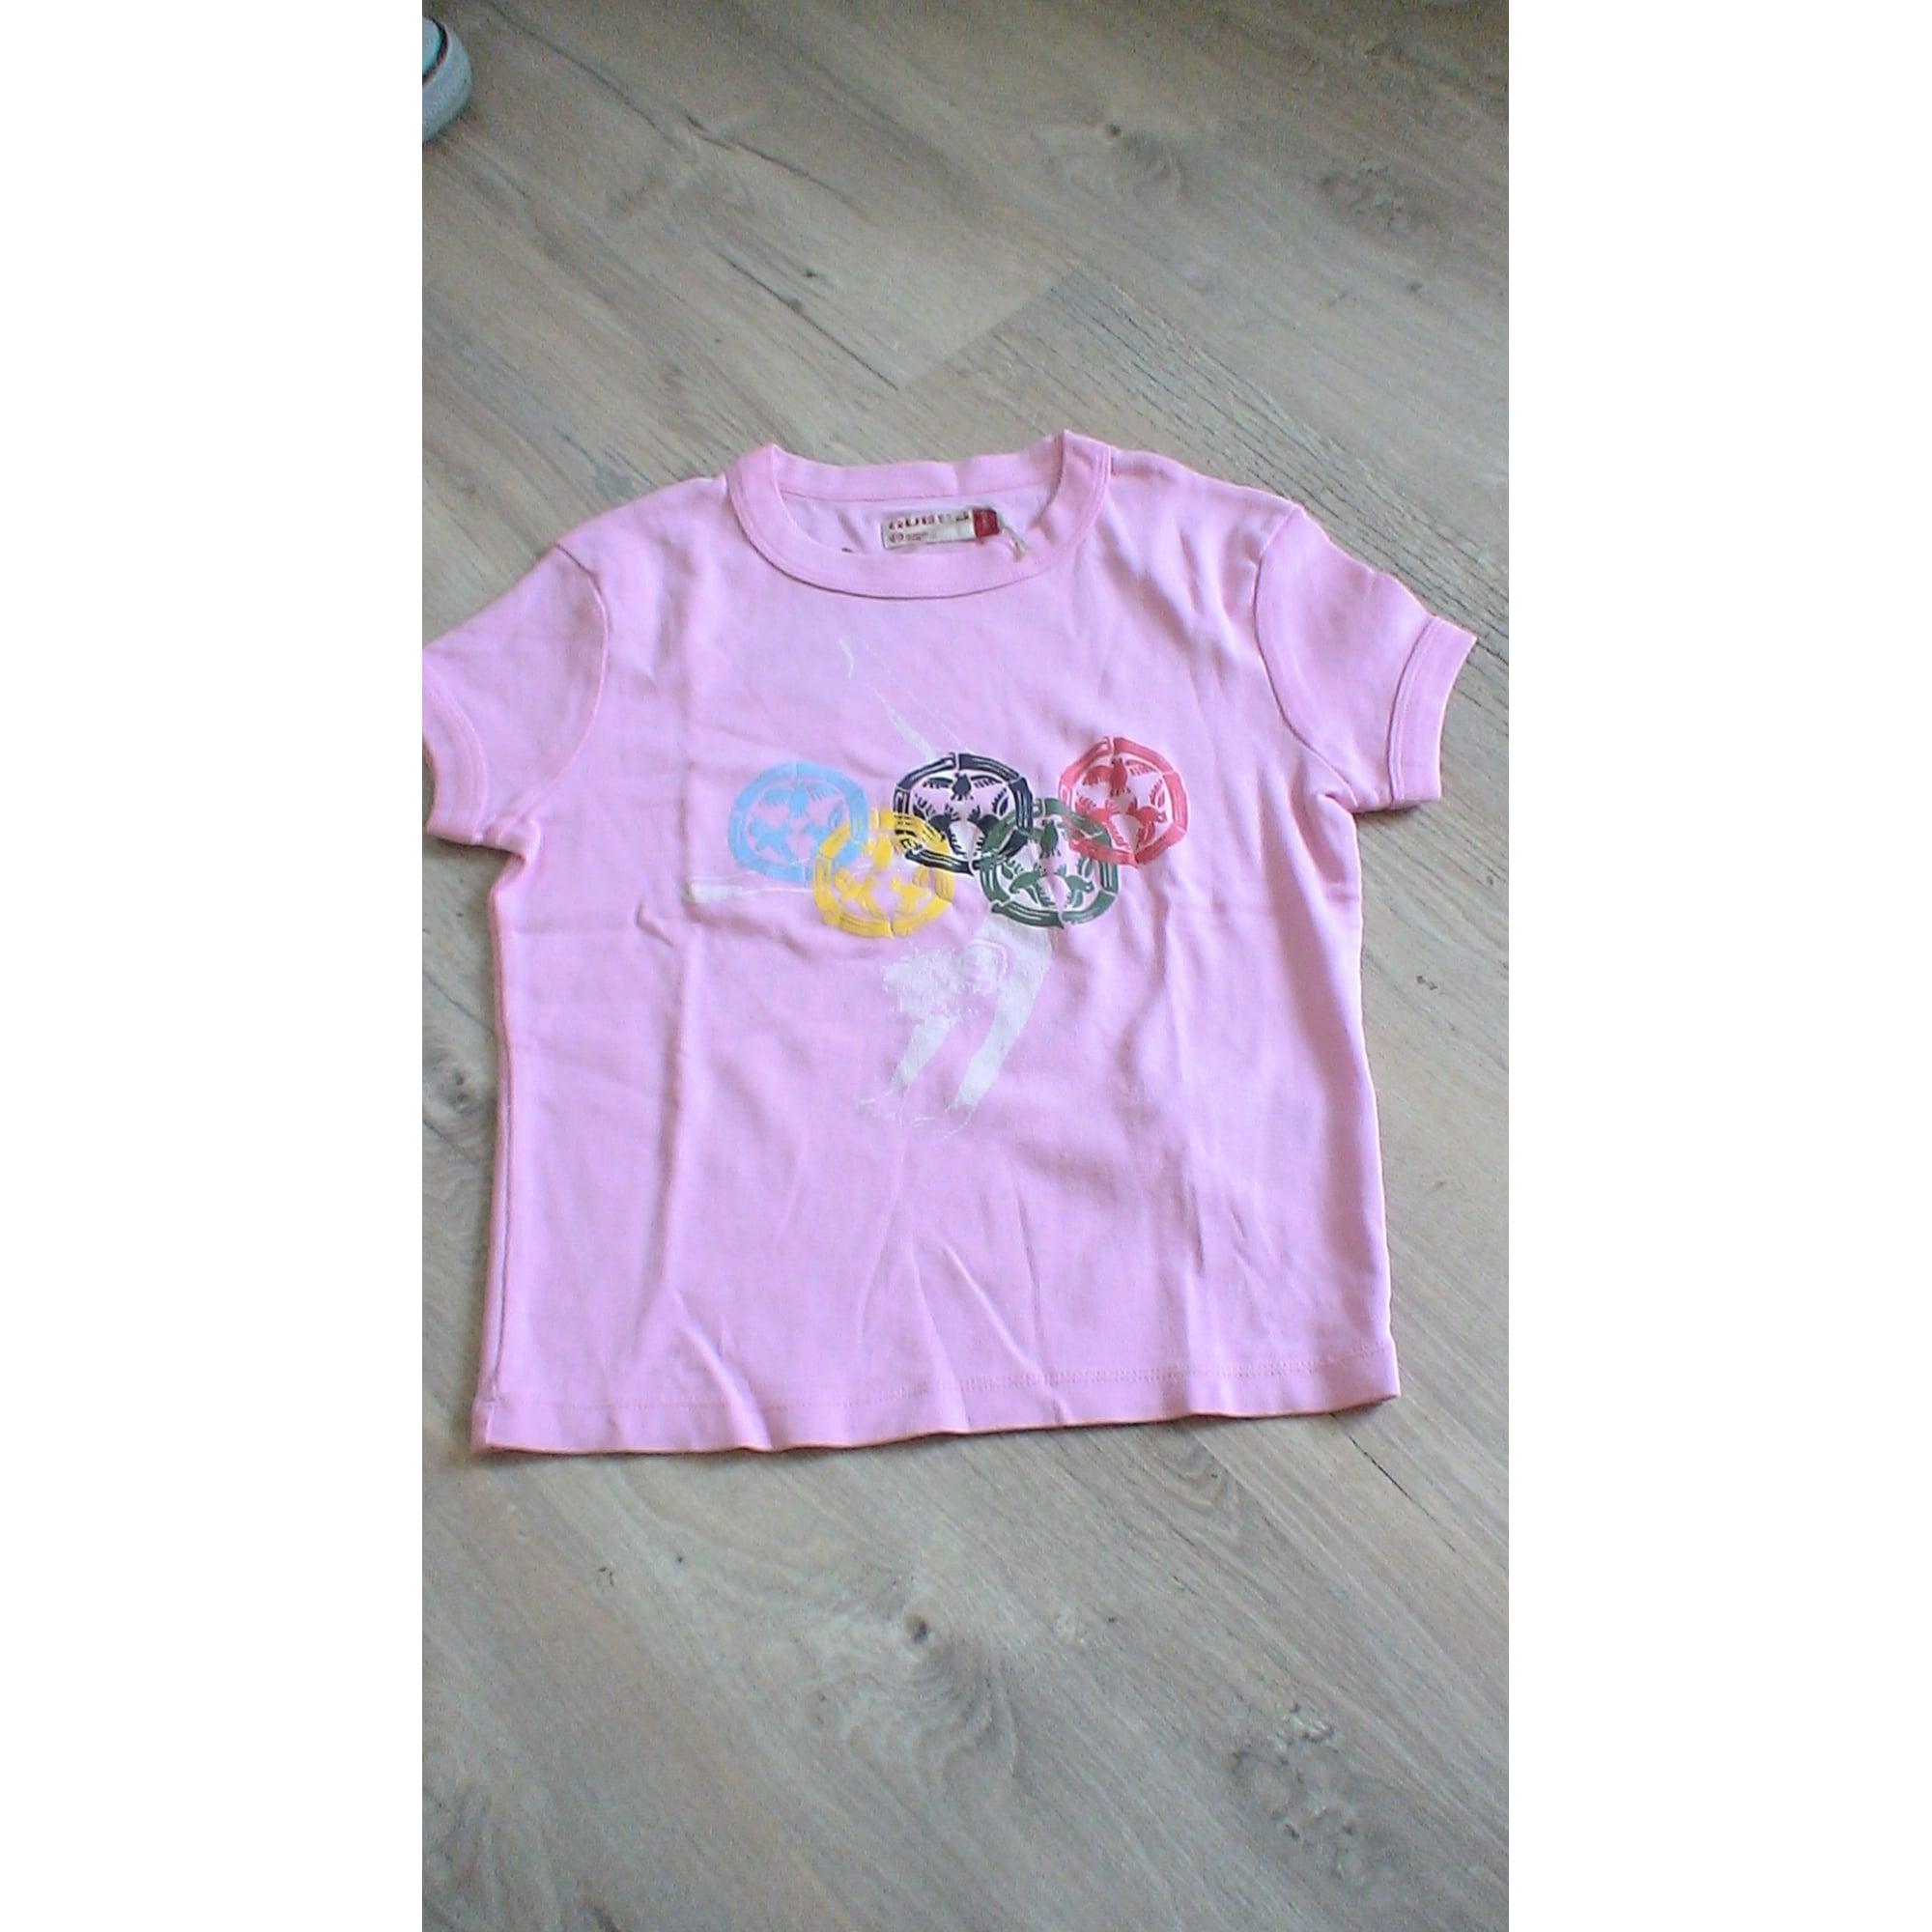 Top, Tee-shirt GUESS Rose, fuschia, vieux rose